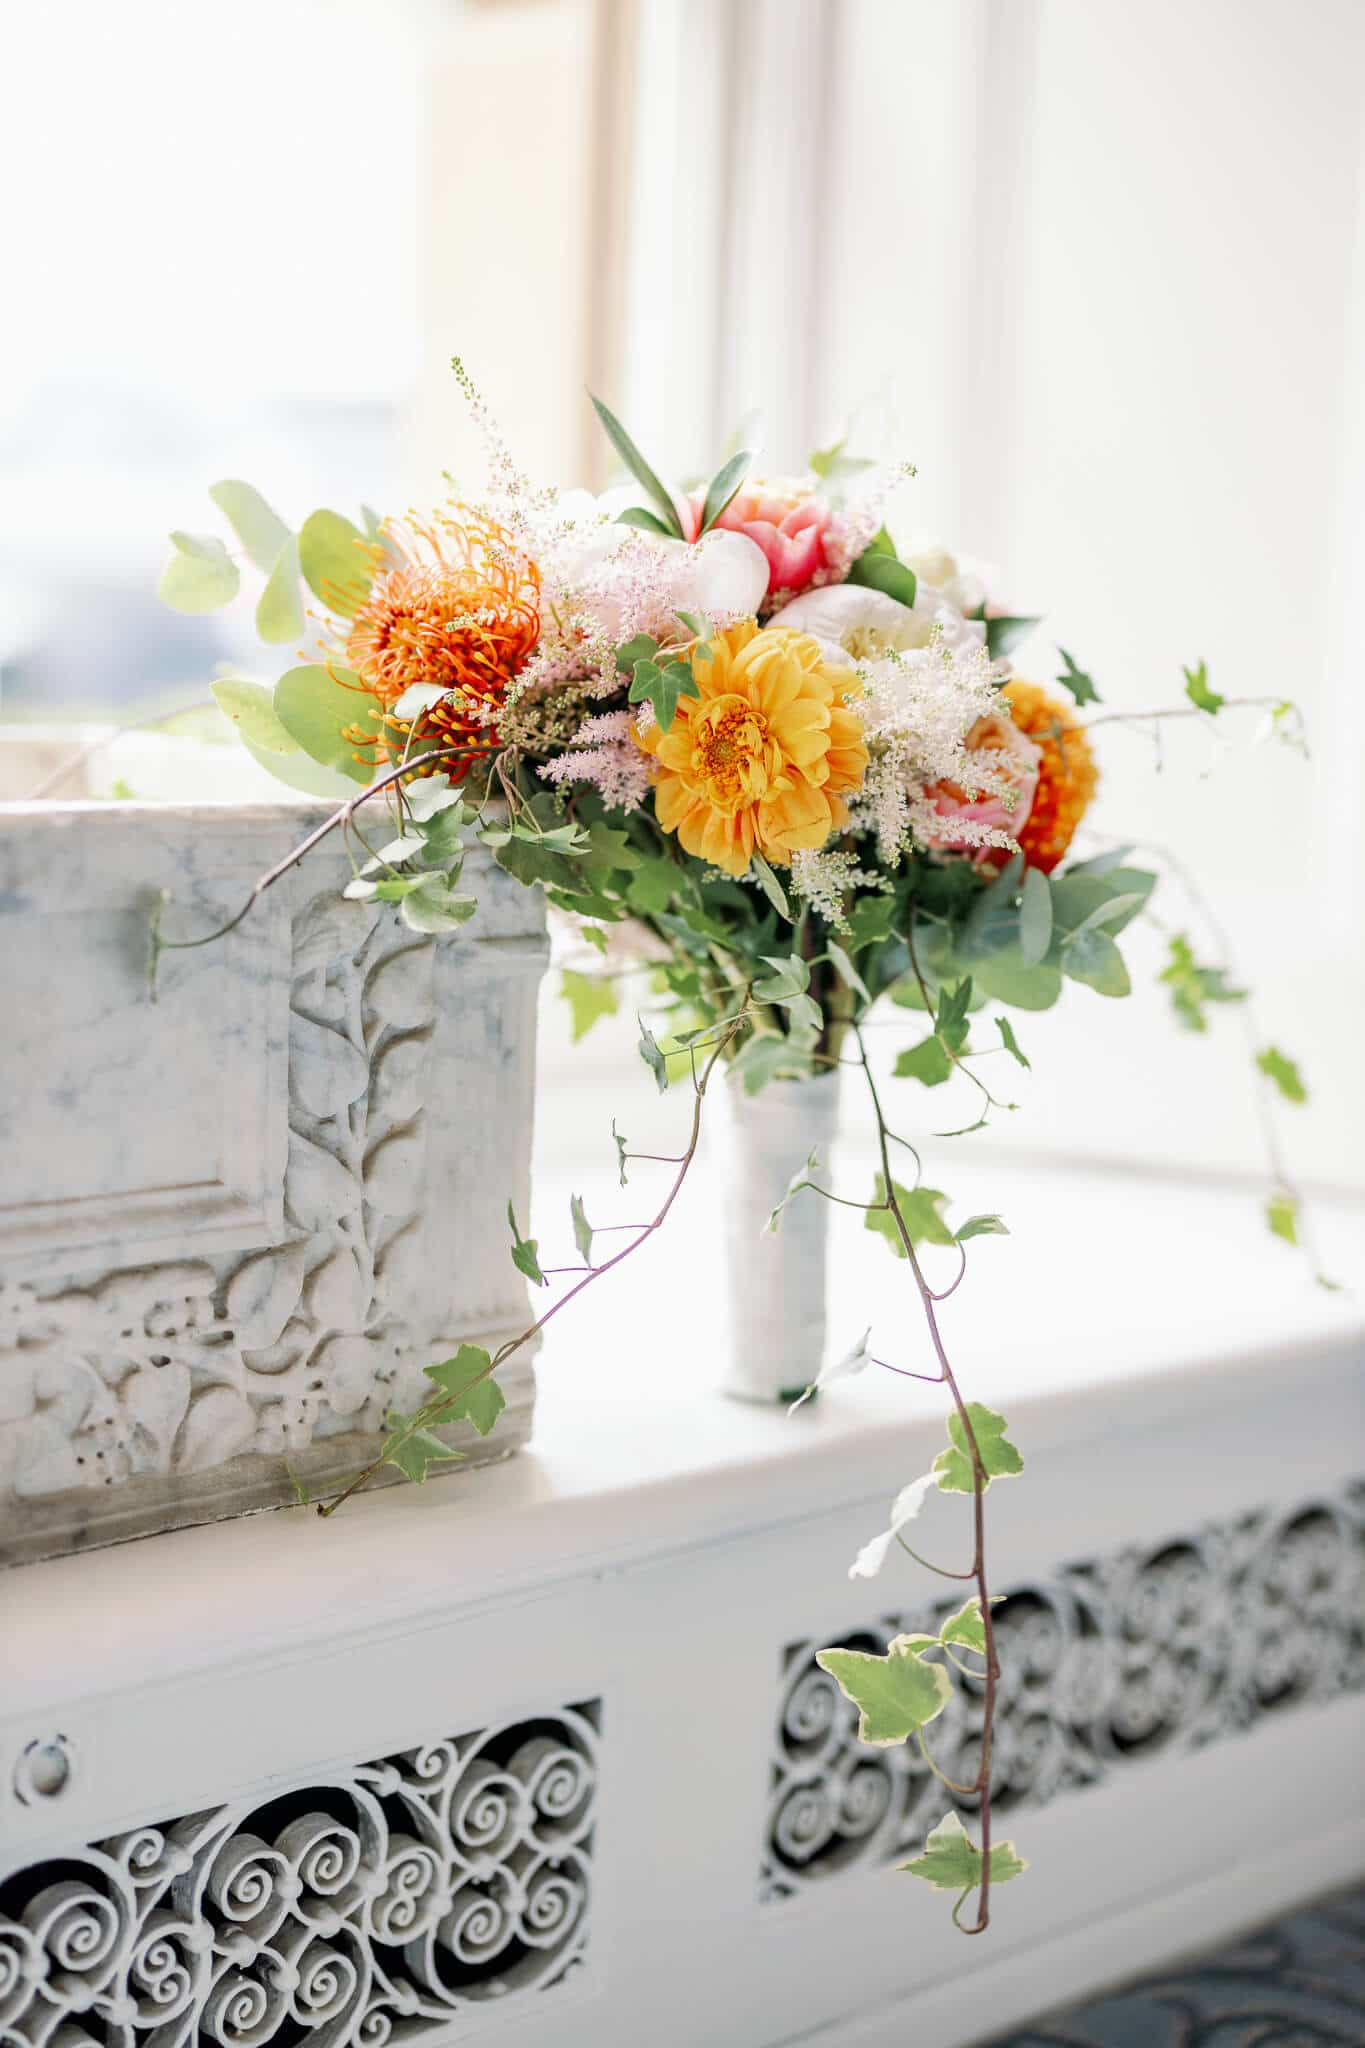 Blomster Designs Flowers wedding bouquet | Berkshire weddings